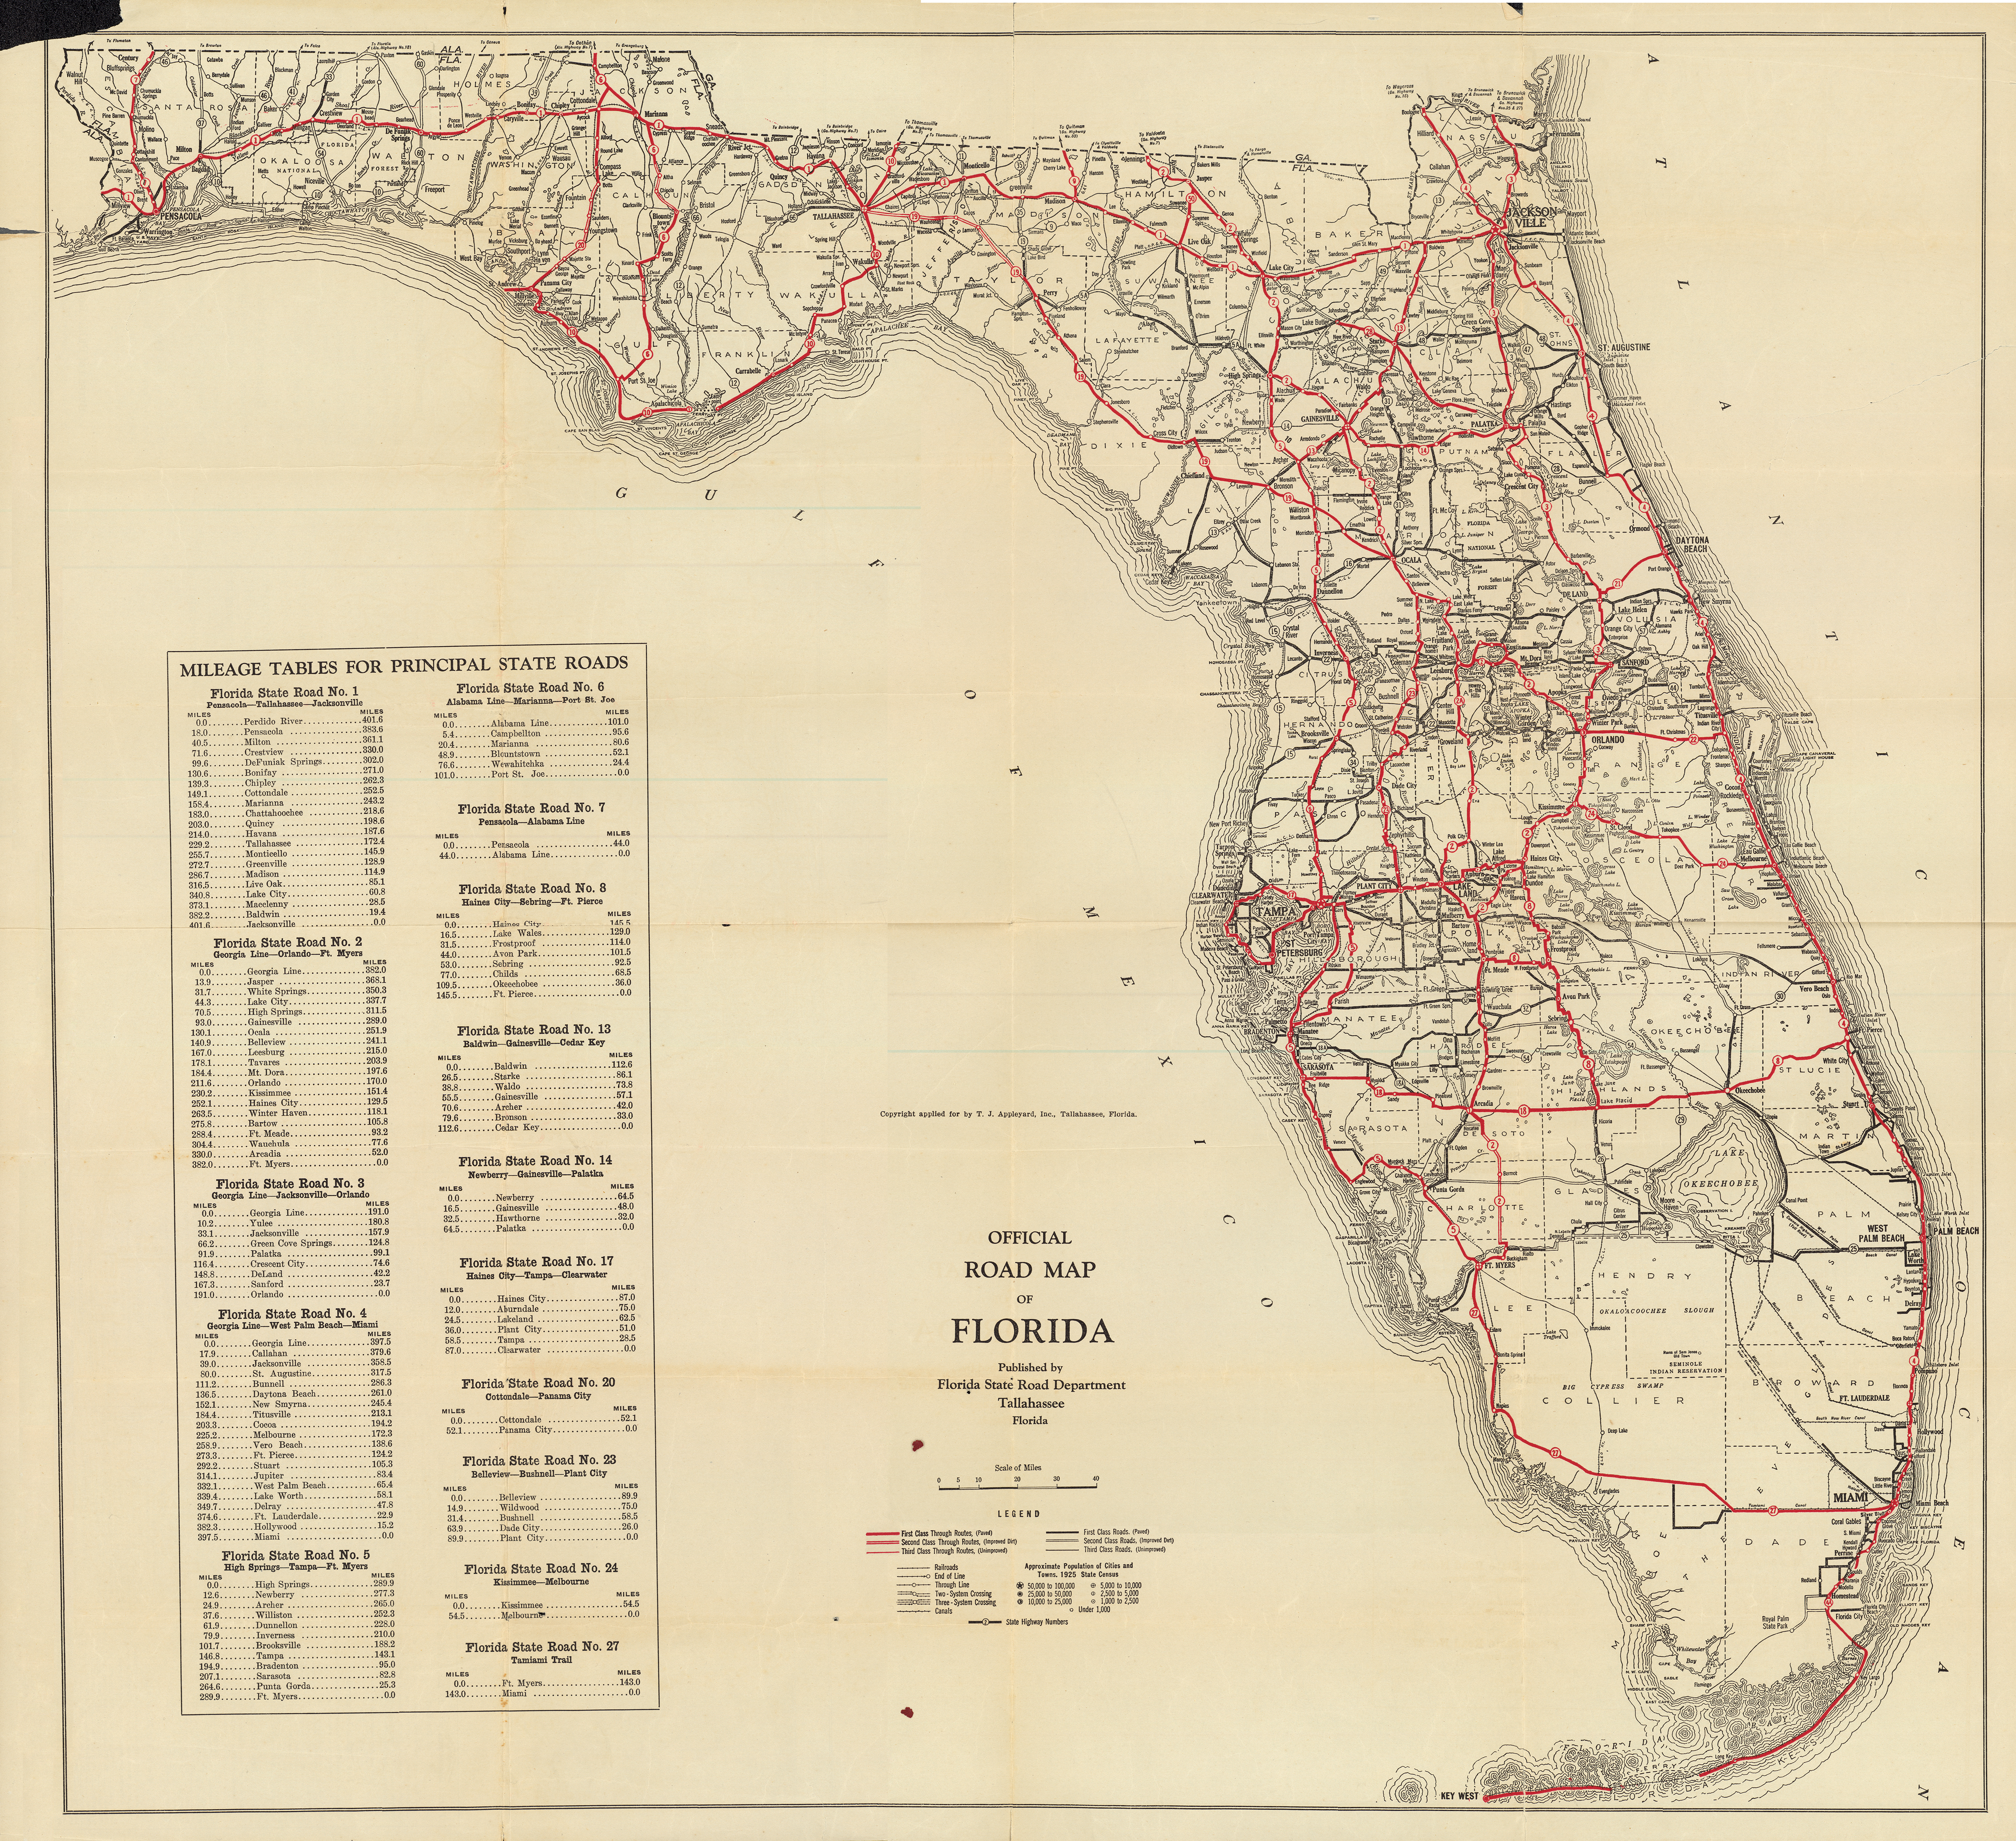 Florida Memory - Official Road Map Of Florida, 1930 - Carrabelle Florida Map